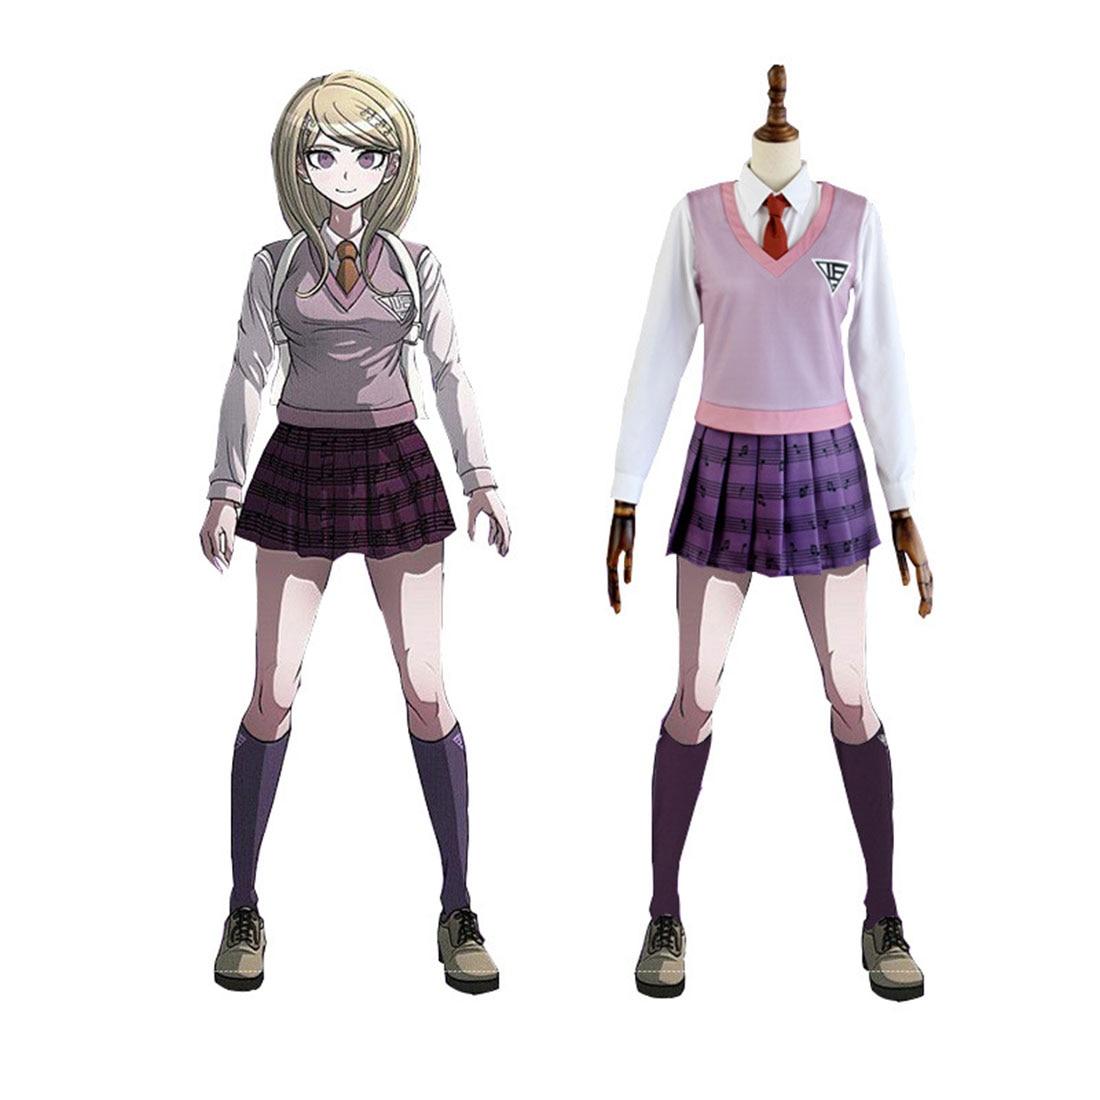 Danganronpa V3 Akamatsu Kaede JK uniforme de la escuela traje de Cosplay-S/M/L/XL/XXL